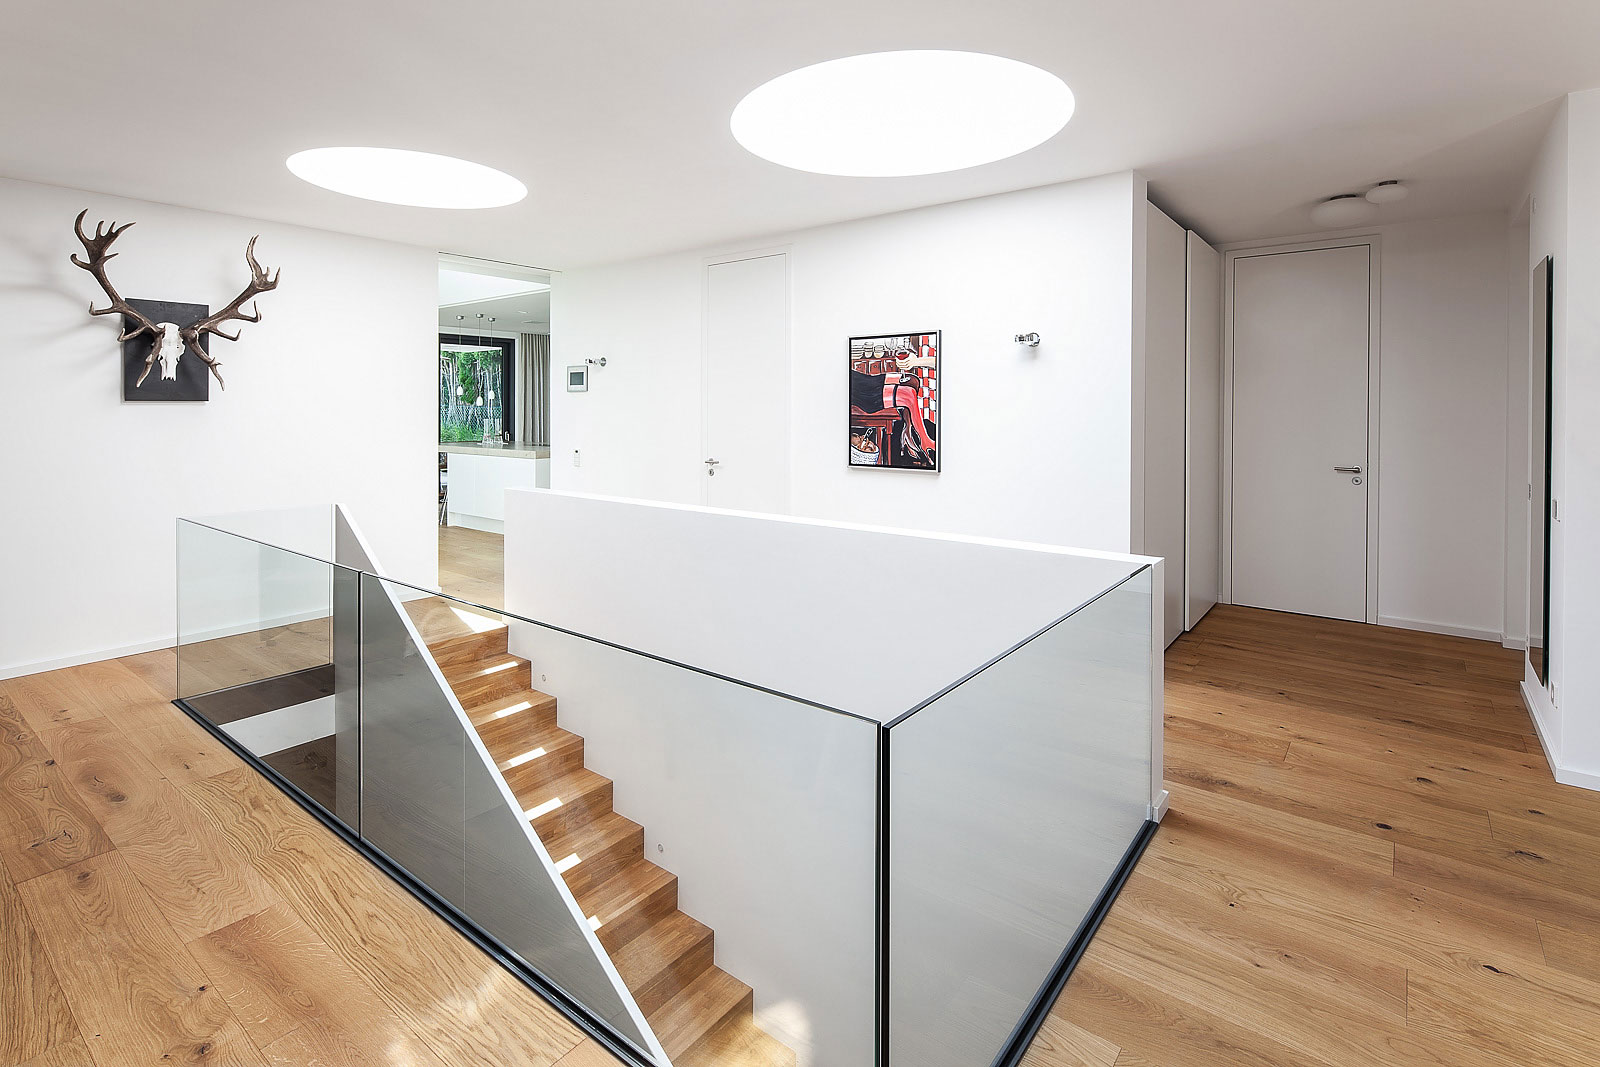 Architekturfotograf, Innenaufnahme, Treppenhaus, Architekturfotografie